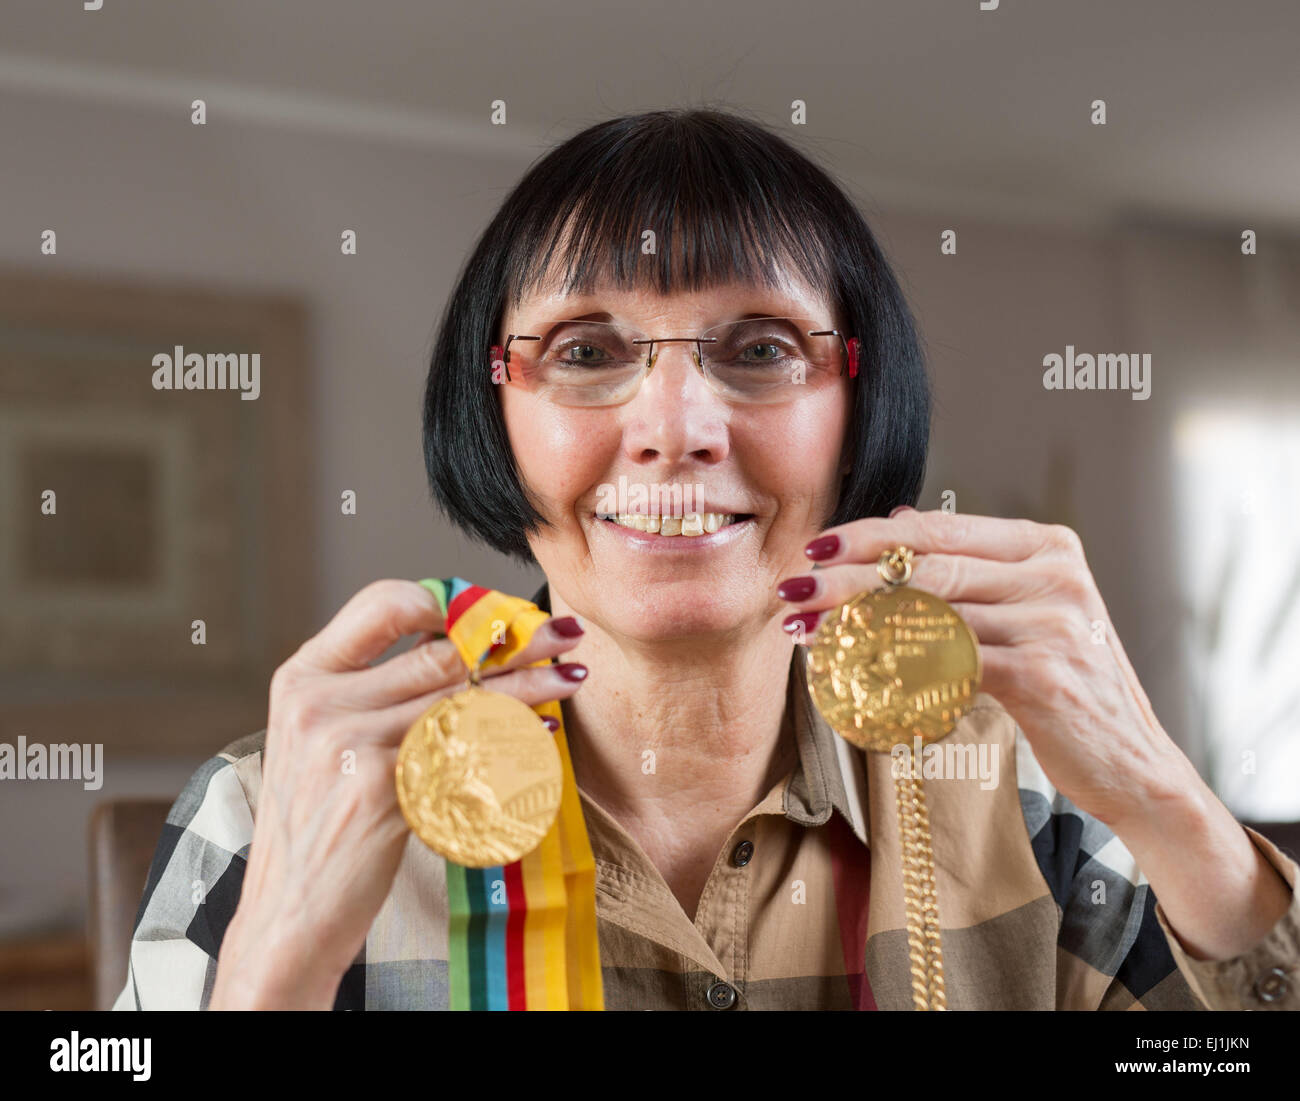 Barbel Wockel 4 Olympic medals nude photos 2019